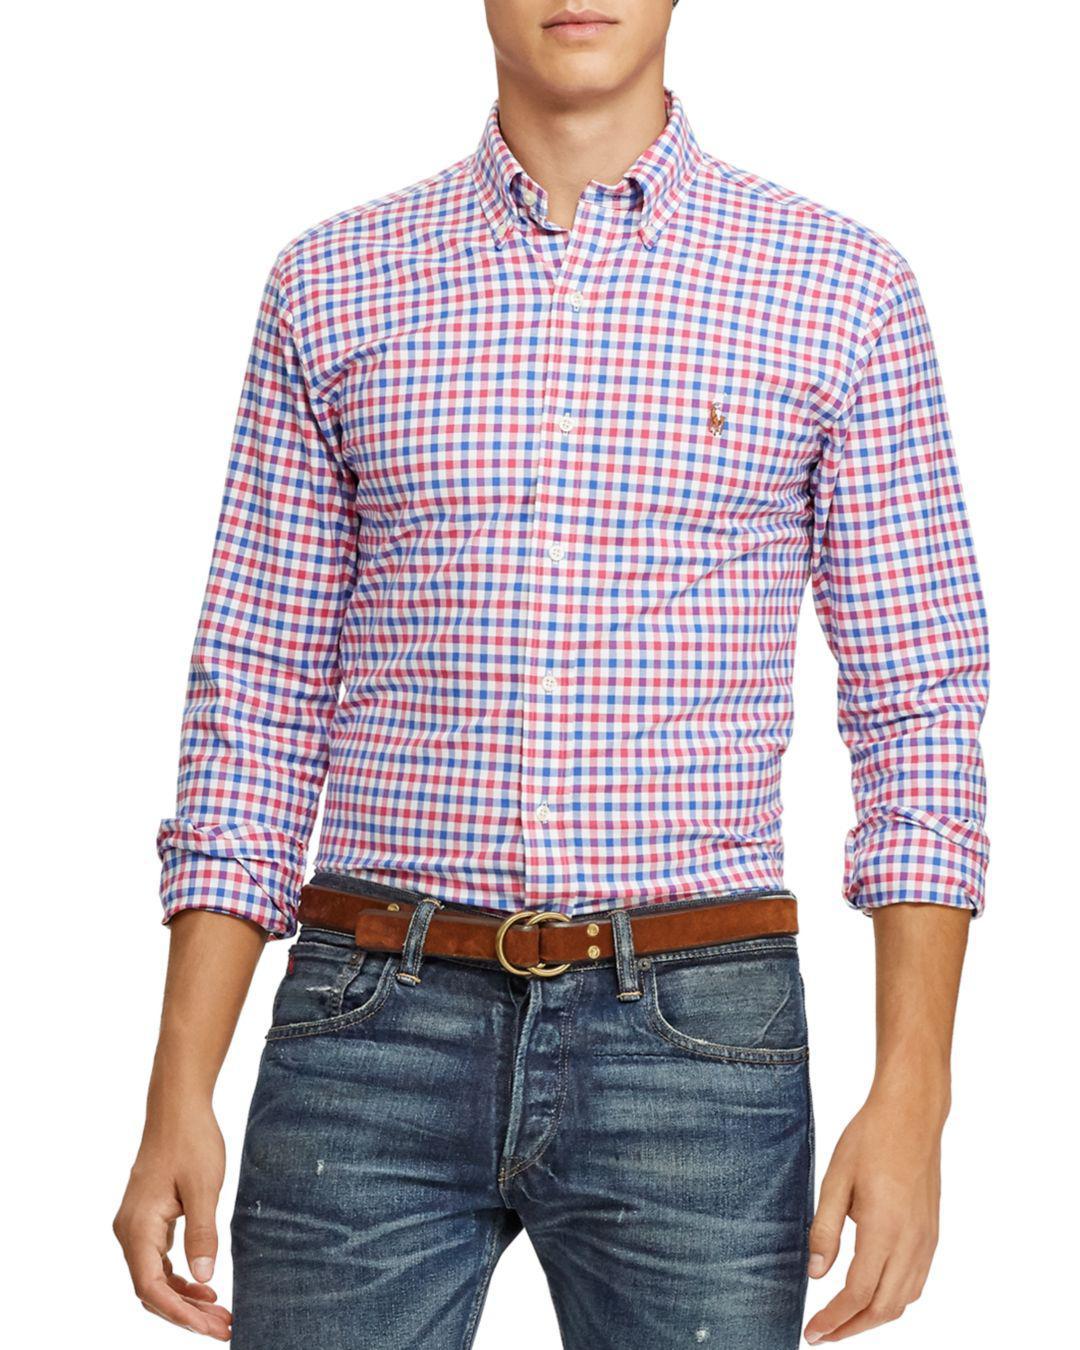 Lyst - Polo Ralph Lauren Check Slim Fit Button-down Shirt for Men ... 3dcf7f9a230